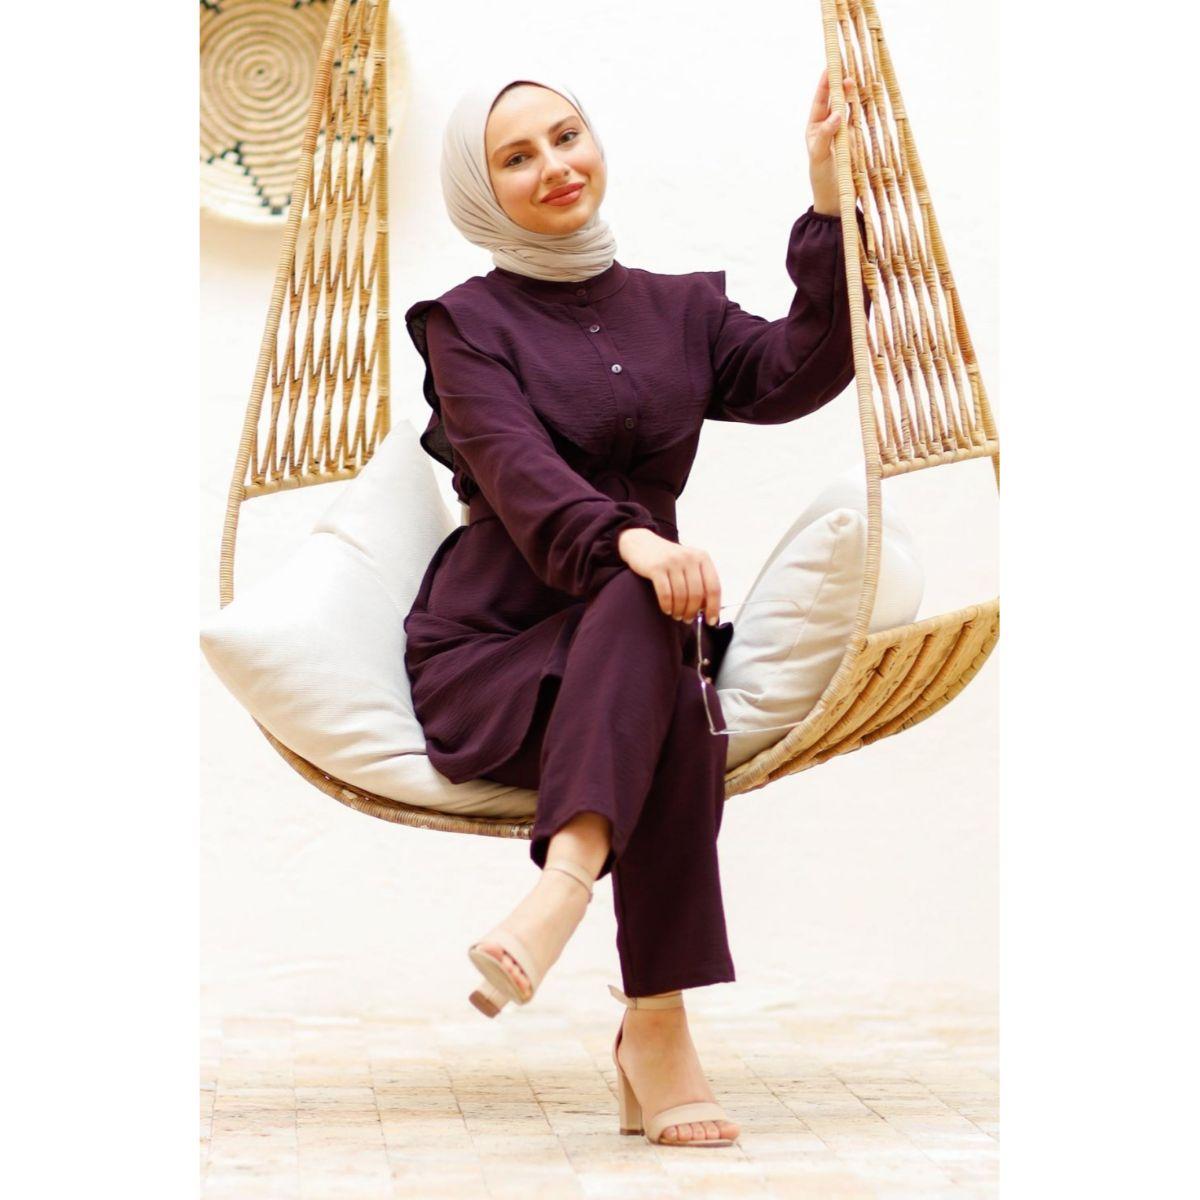 2 Pieces Comforabl Women's Set, Maxi Tunic and Pant Double Suit For Winter Islamic Fashion Muslim Clothing Turkey Dubai 2021